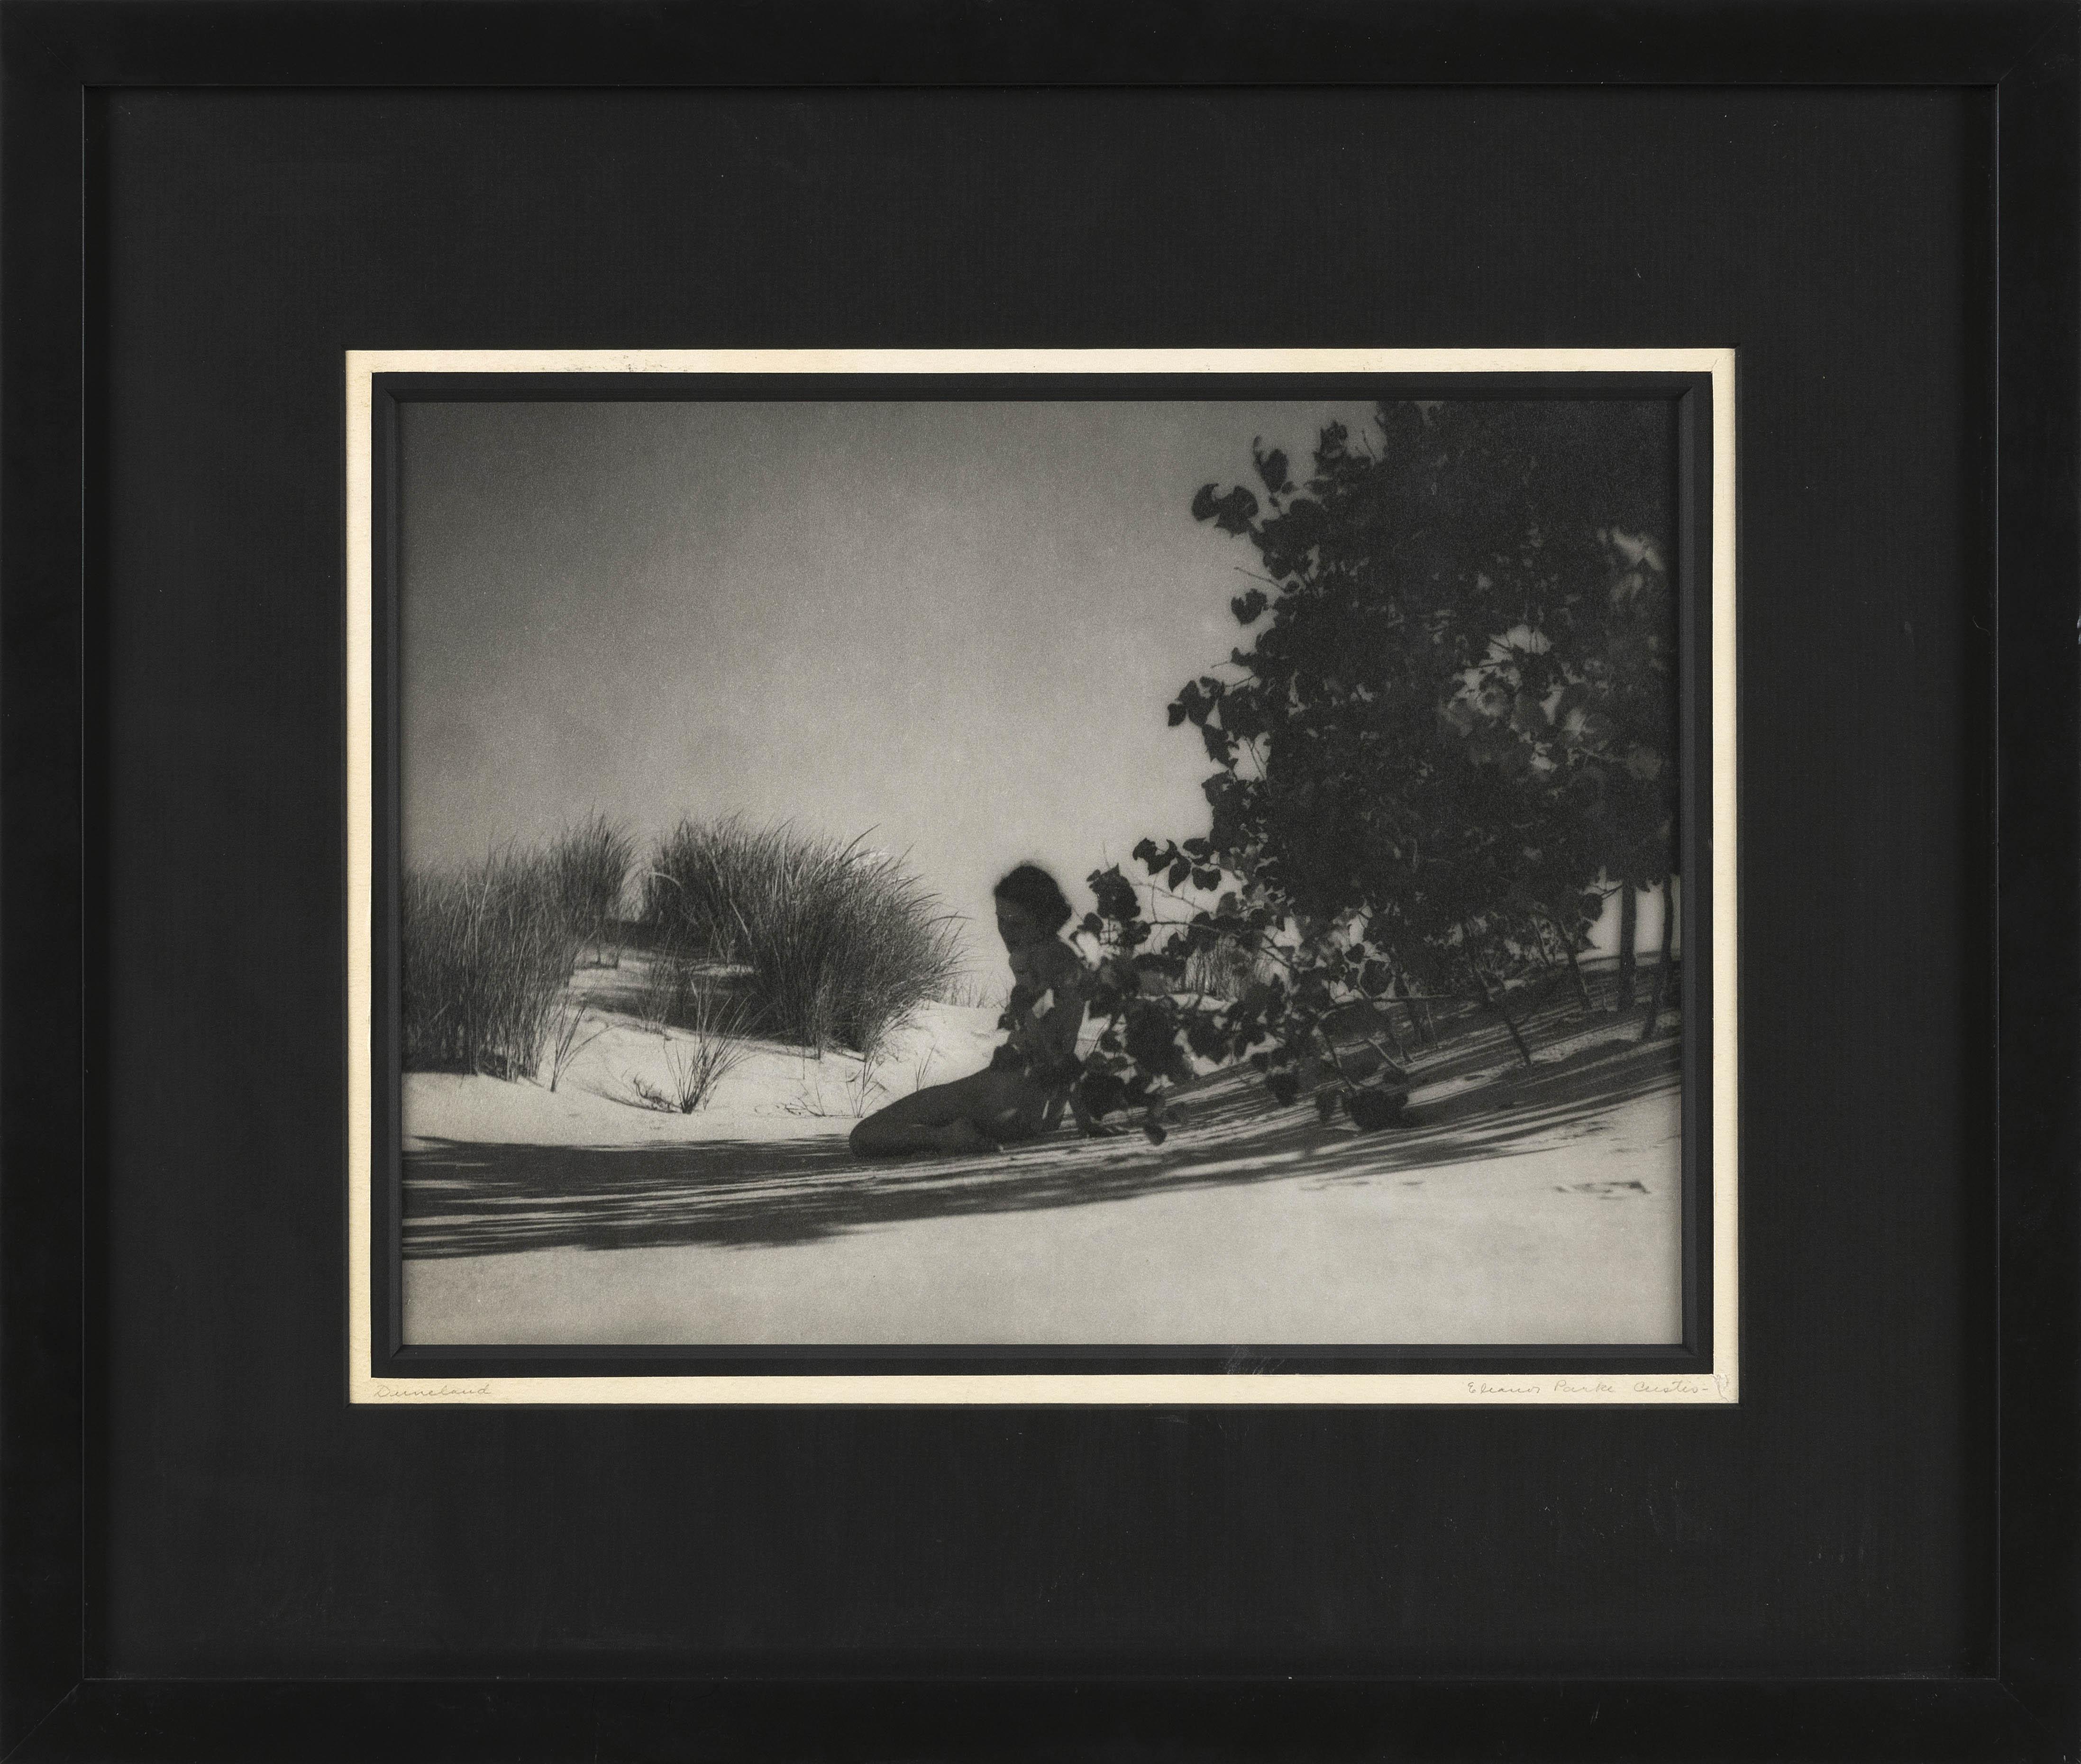 ELEANOR PARKE CUSTIS (Virginia, 1896-1983),